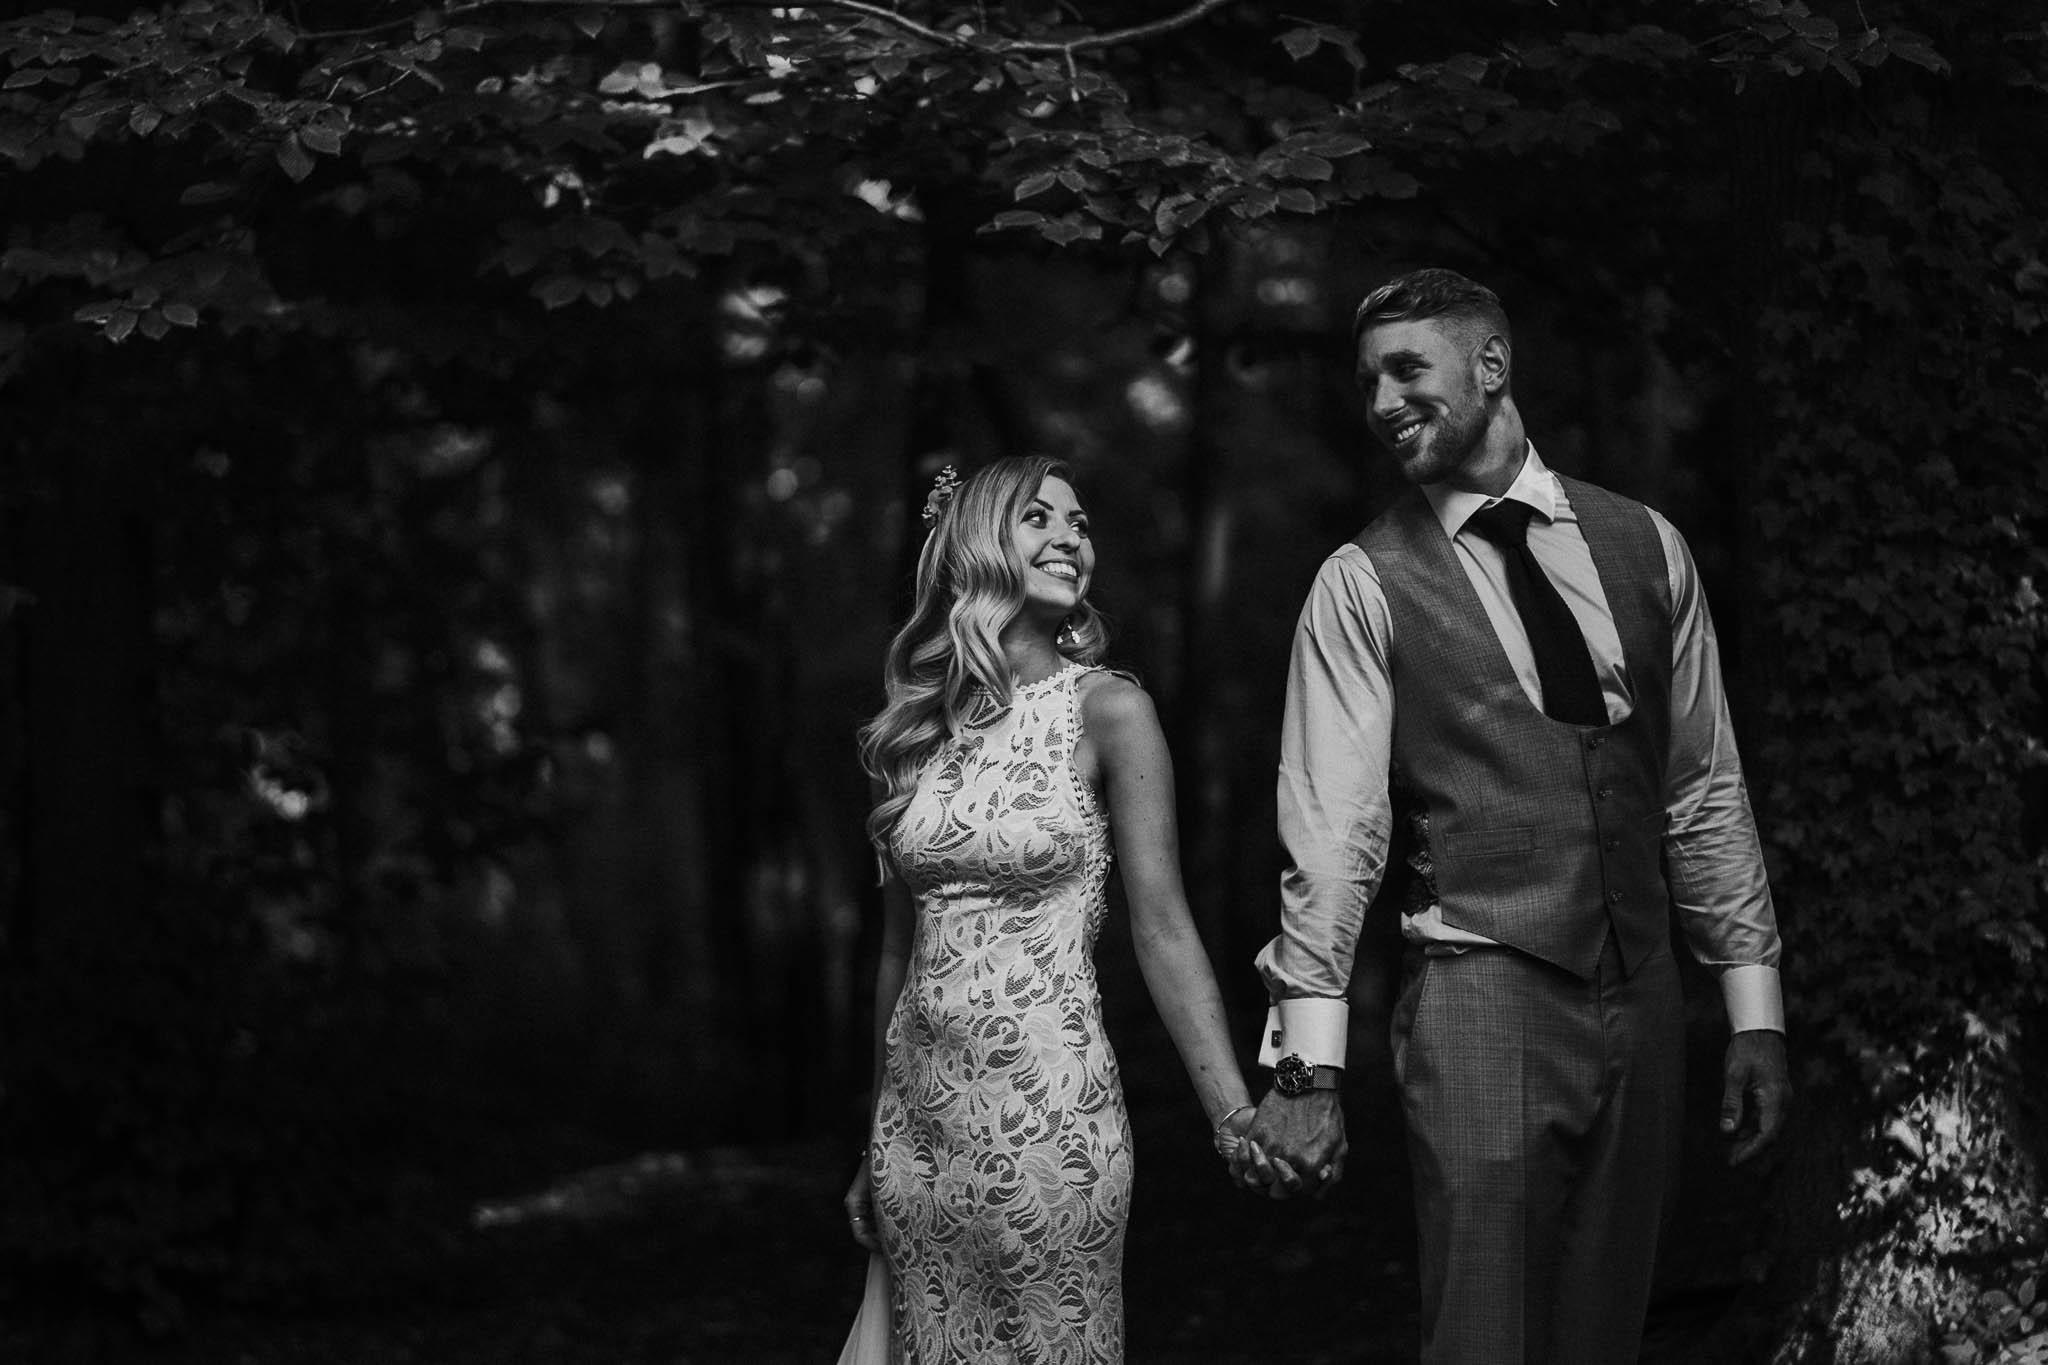 Wedding-Photographer-East-Sussex-39.jpg